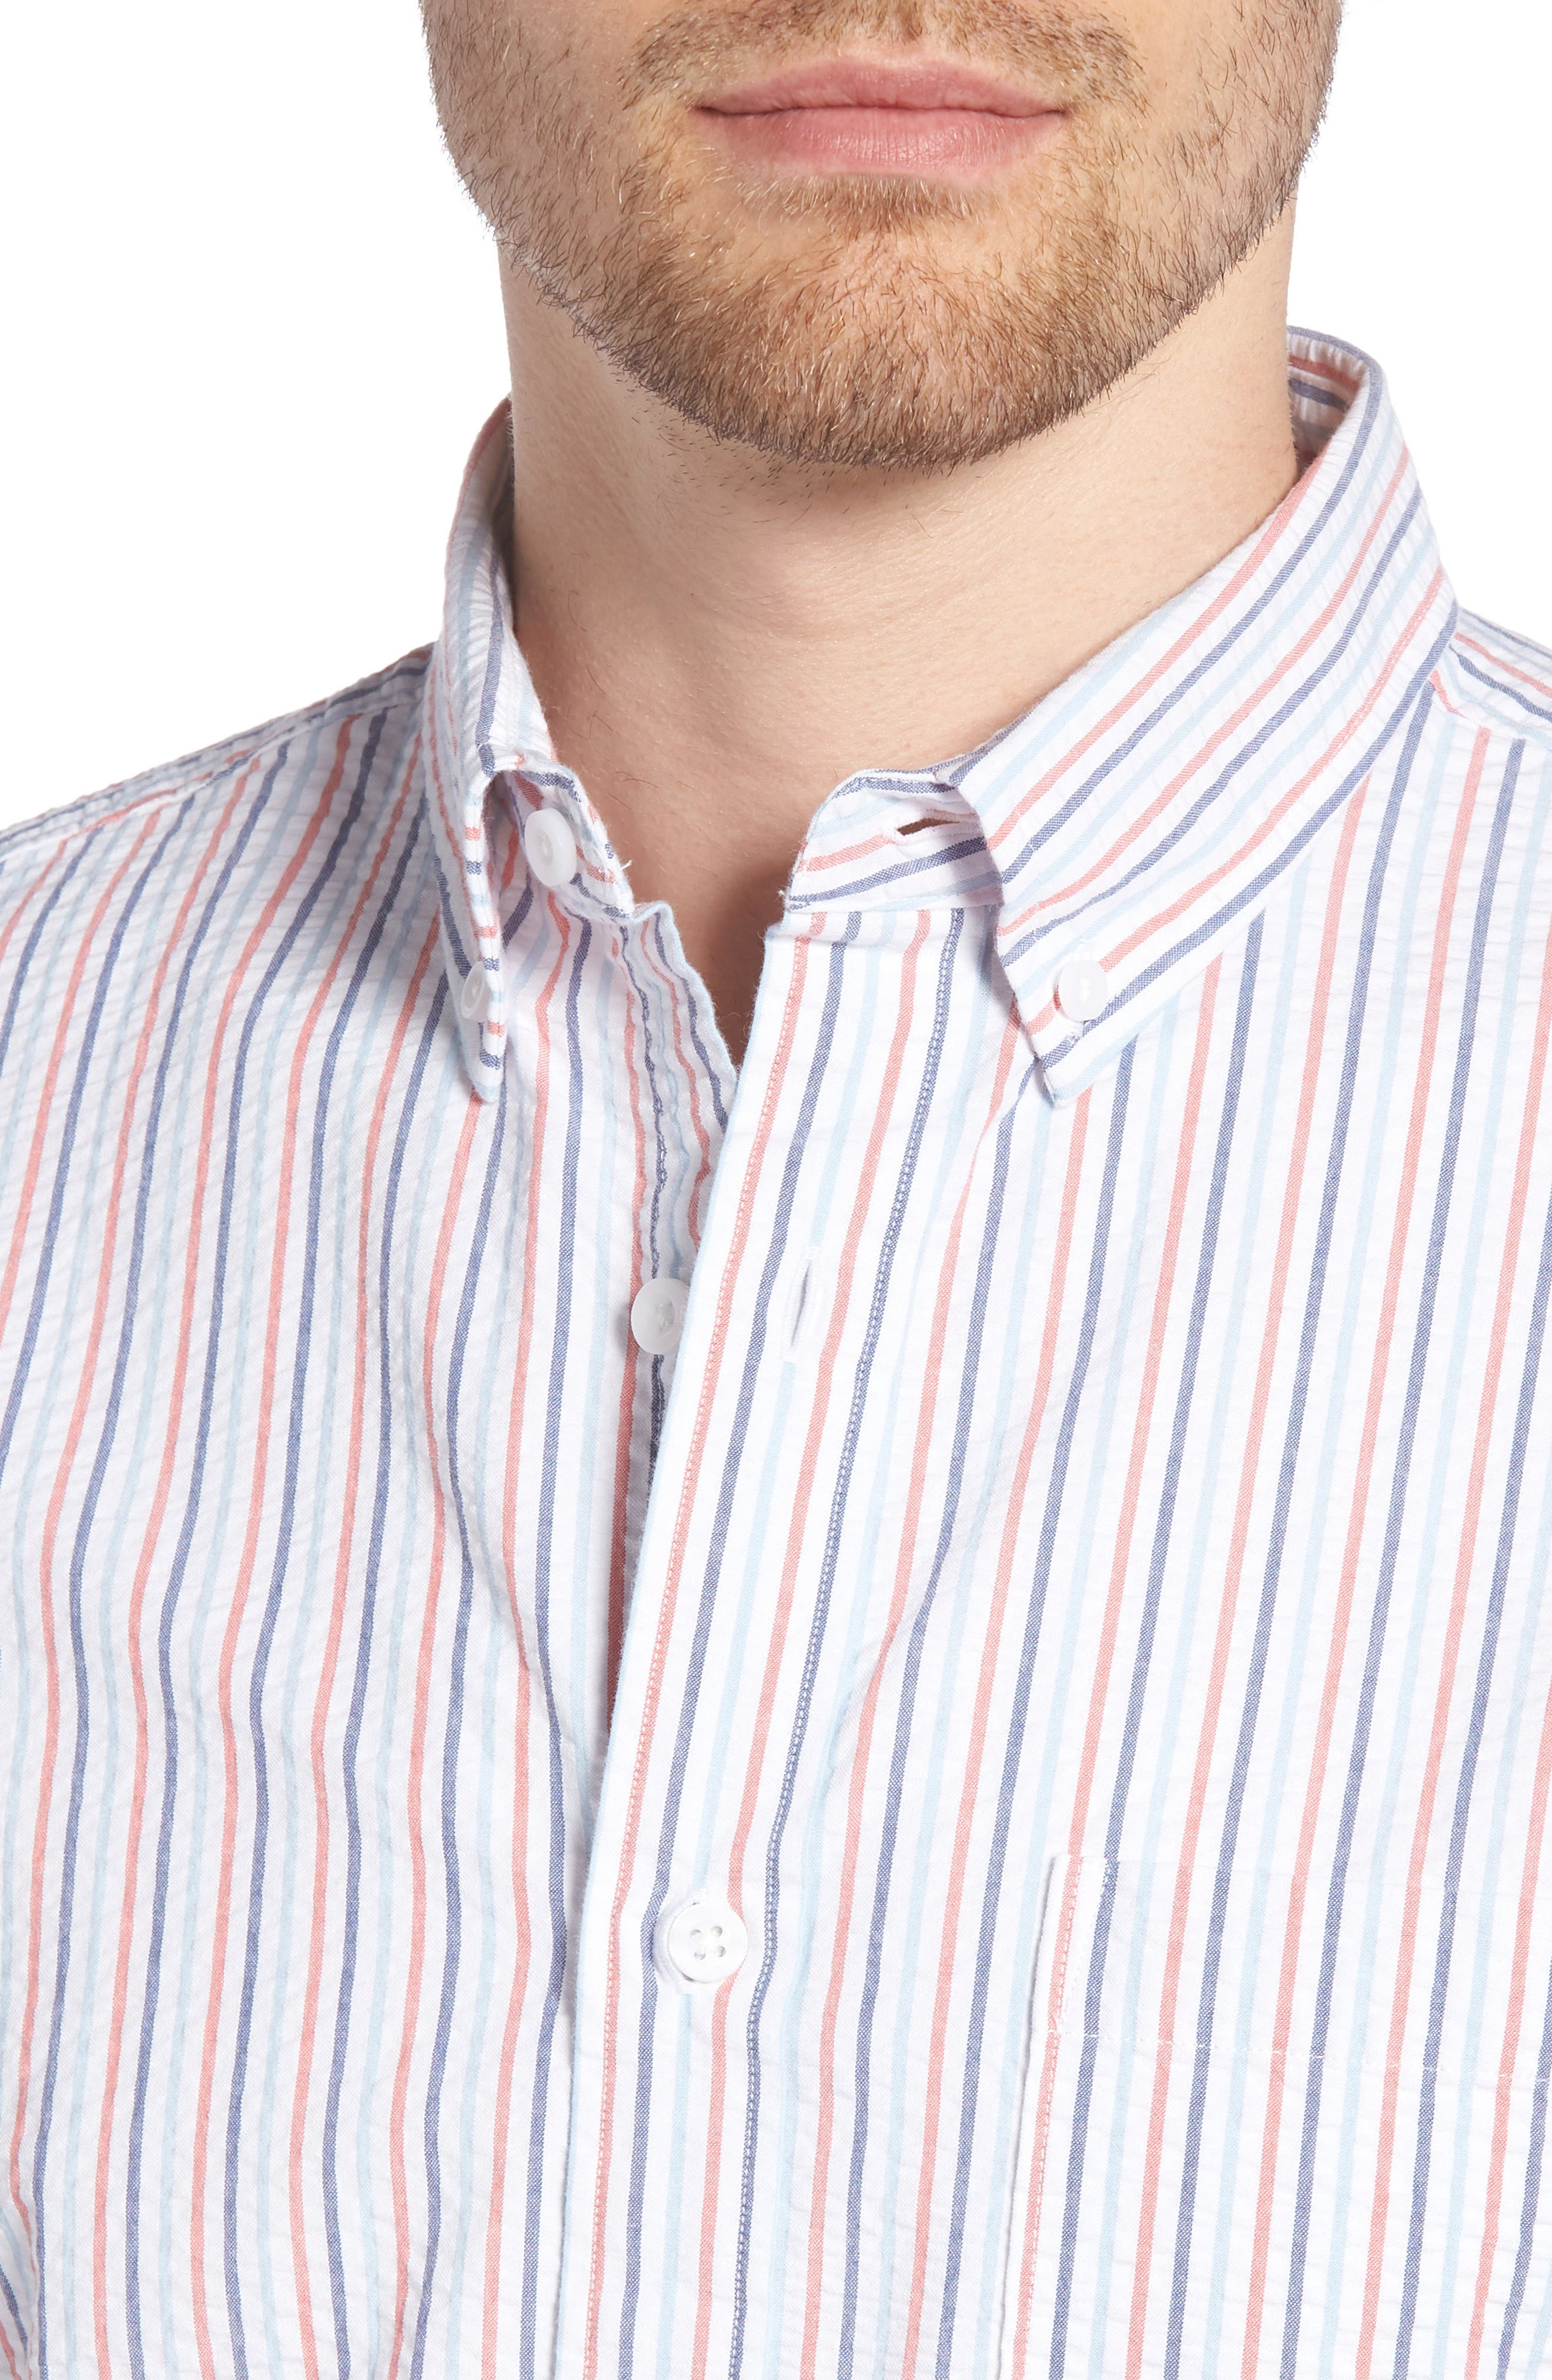 Trim Fit Seersucker Short Sleeve Sport Shirt,                             Alternate thumbnail 4, color,                             WHITE MULTI PENCIL STRIPE